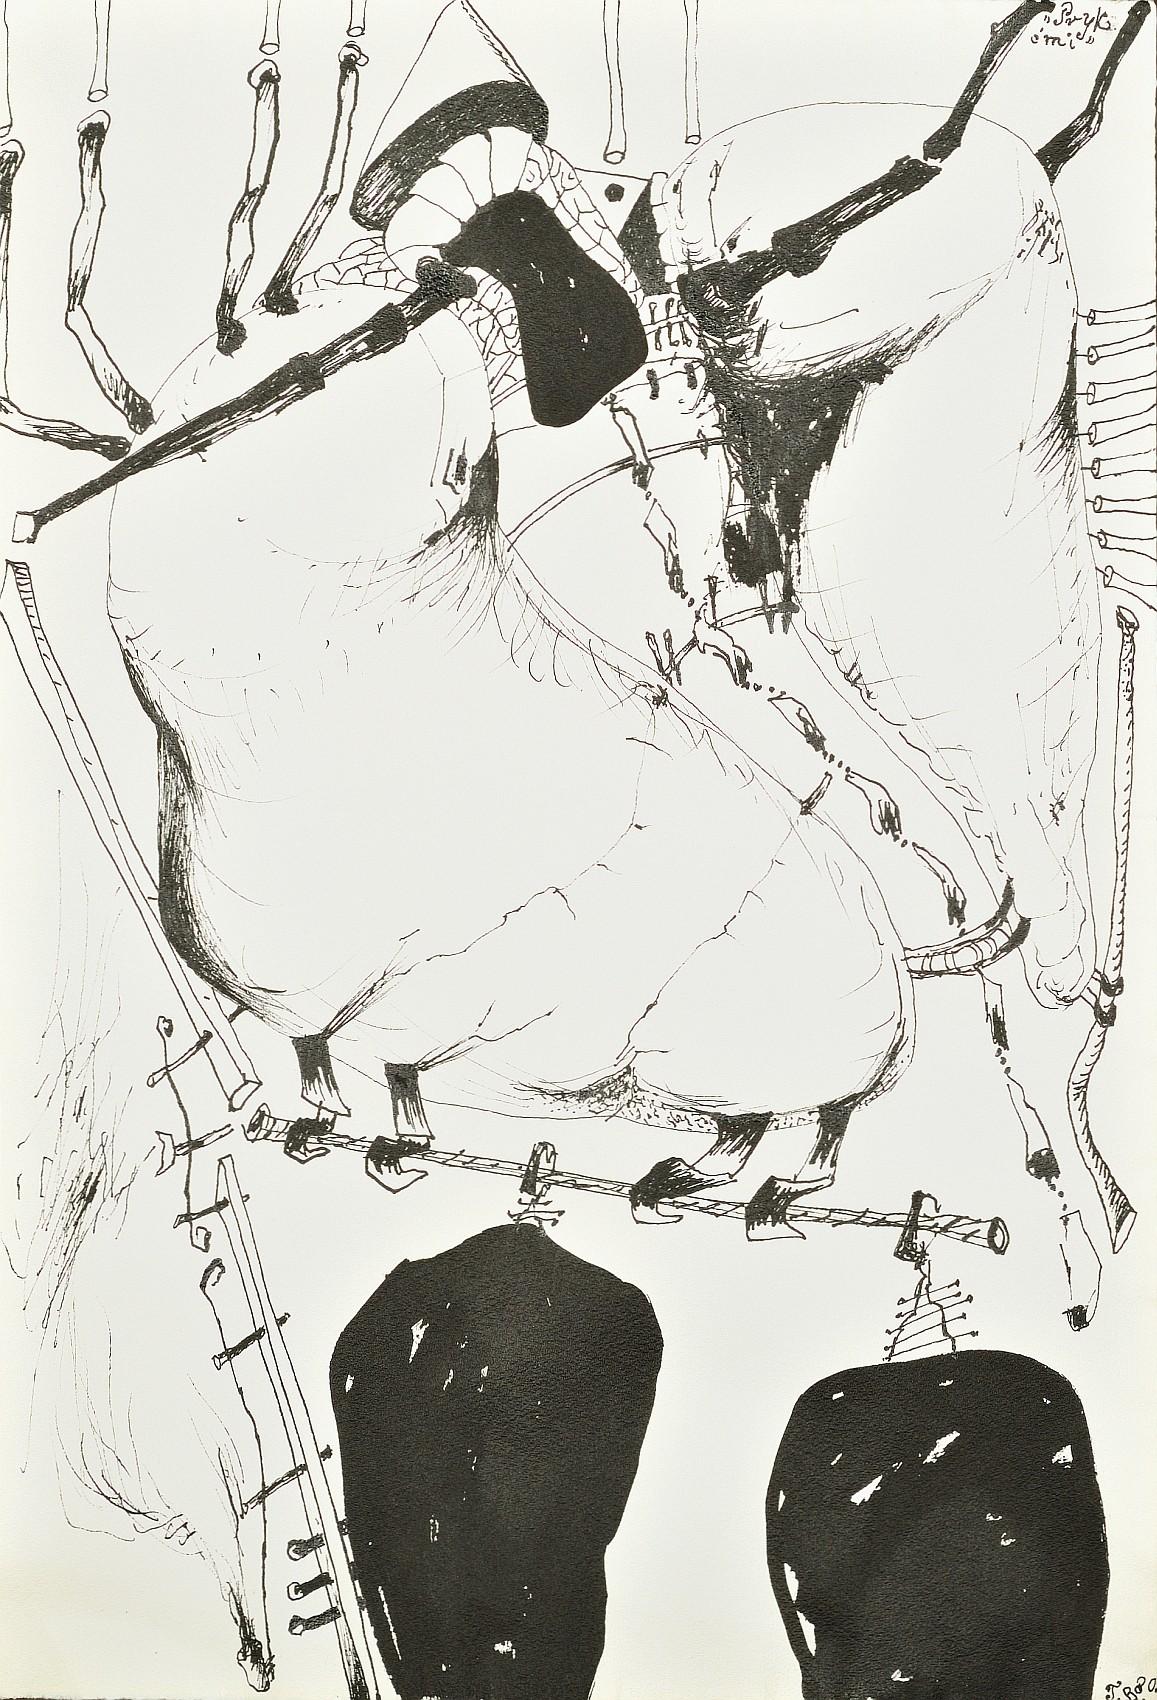 Pryk ćmi, 1980